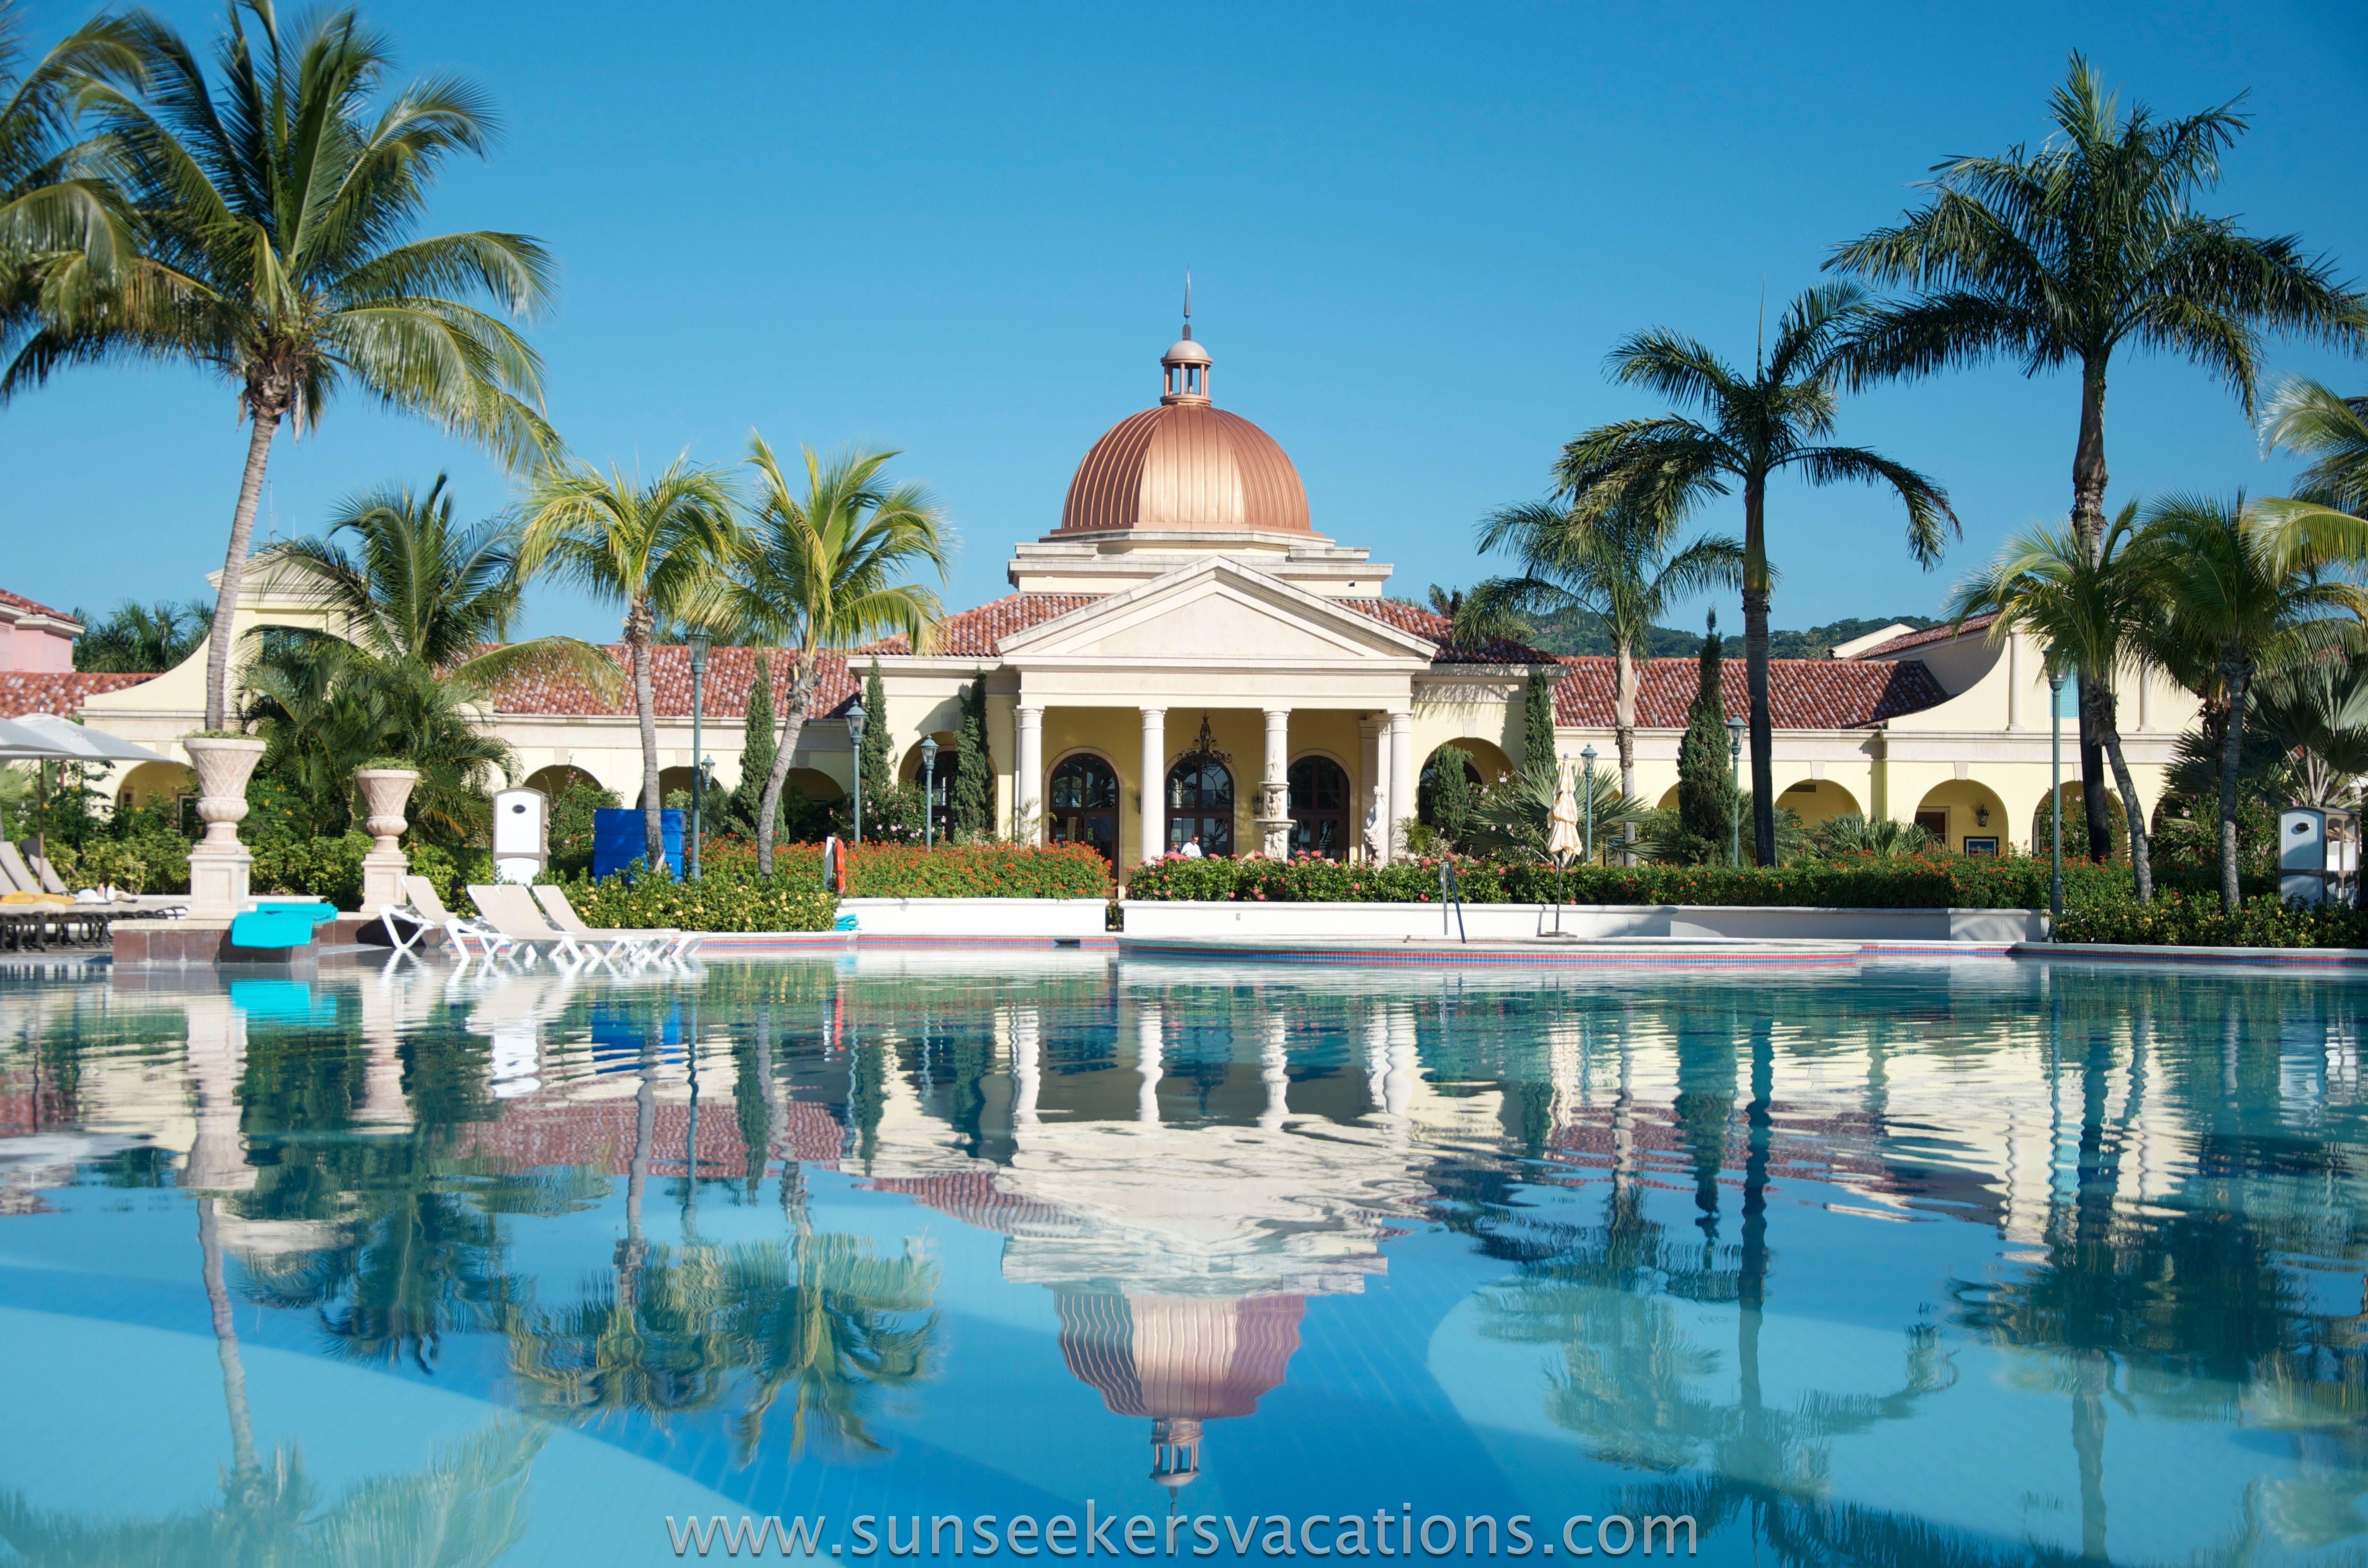 c2179e62b Amazing Sandals Whitehouse Pool!  jamaica. Amazing Sandals Whitehouse Pool!   jamaica Adult Only All Inclusive